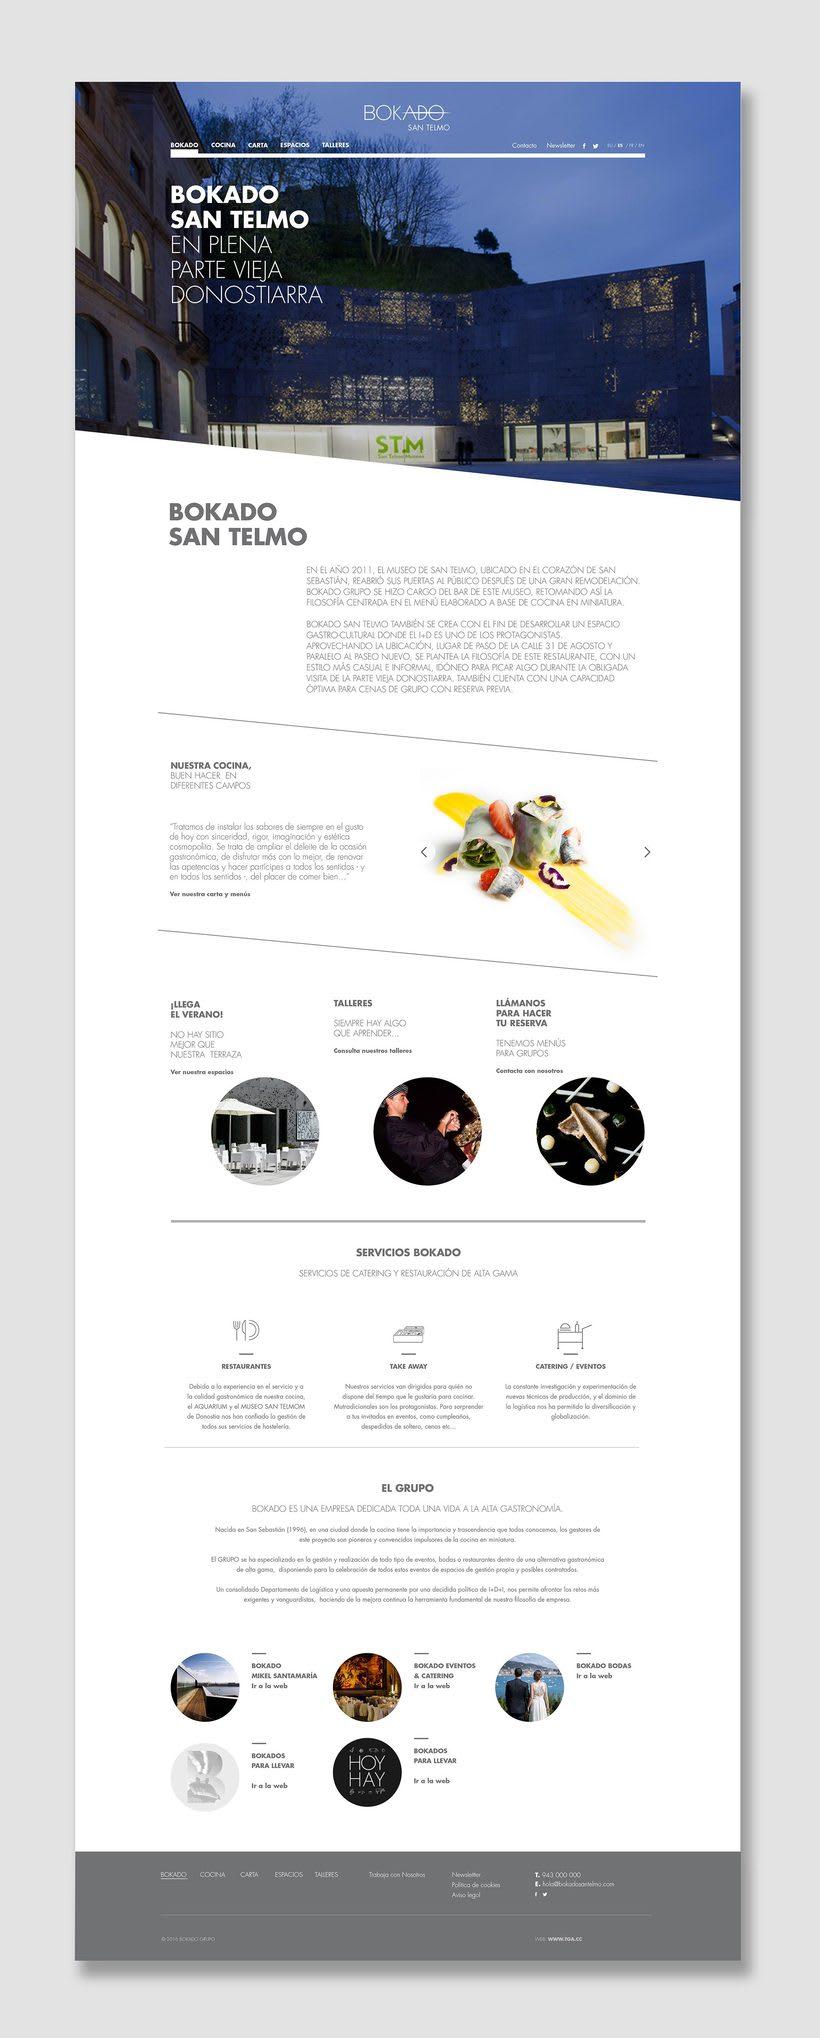 Bokado San Telmo, sitio web 1